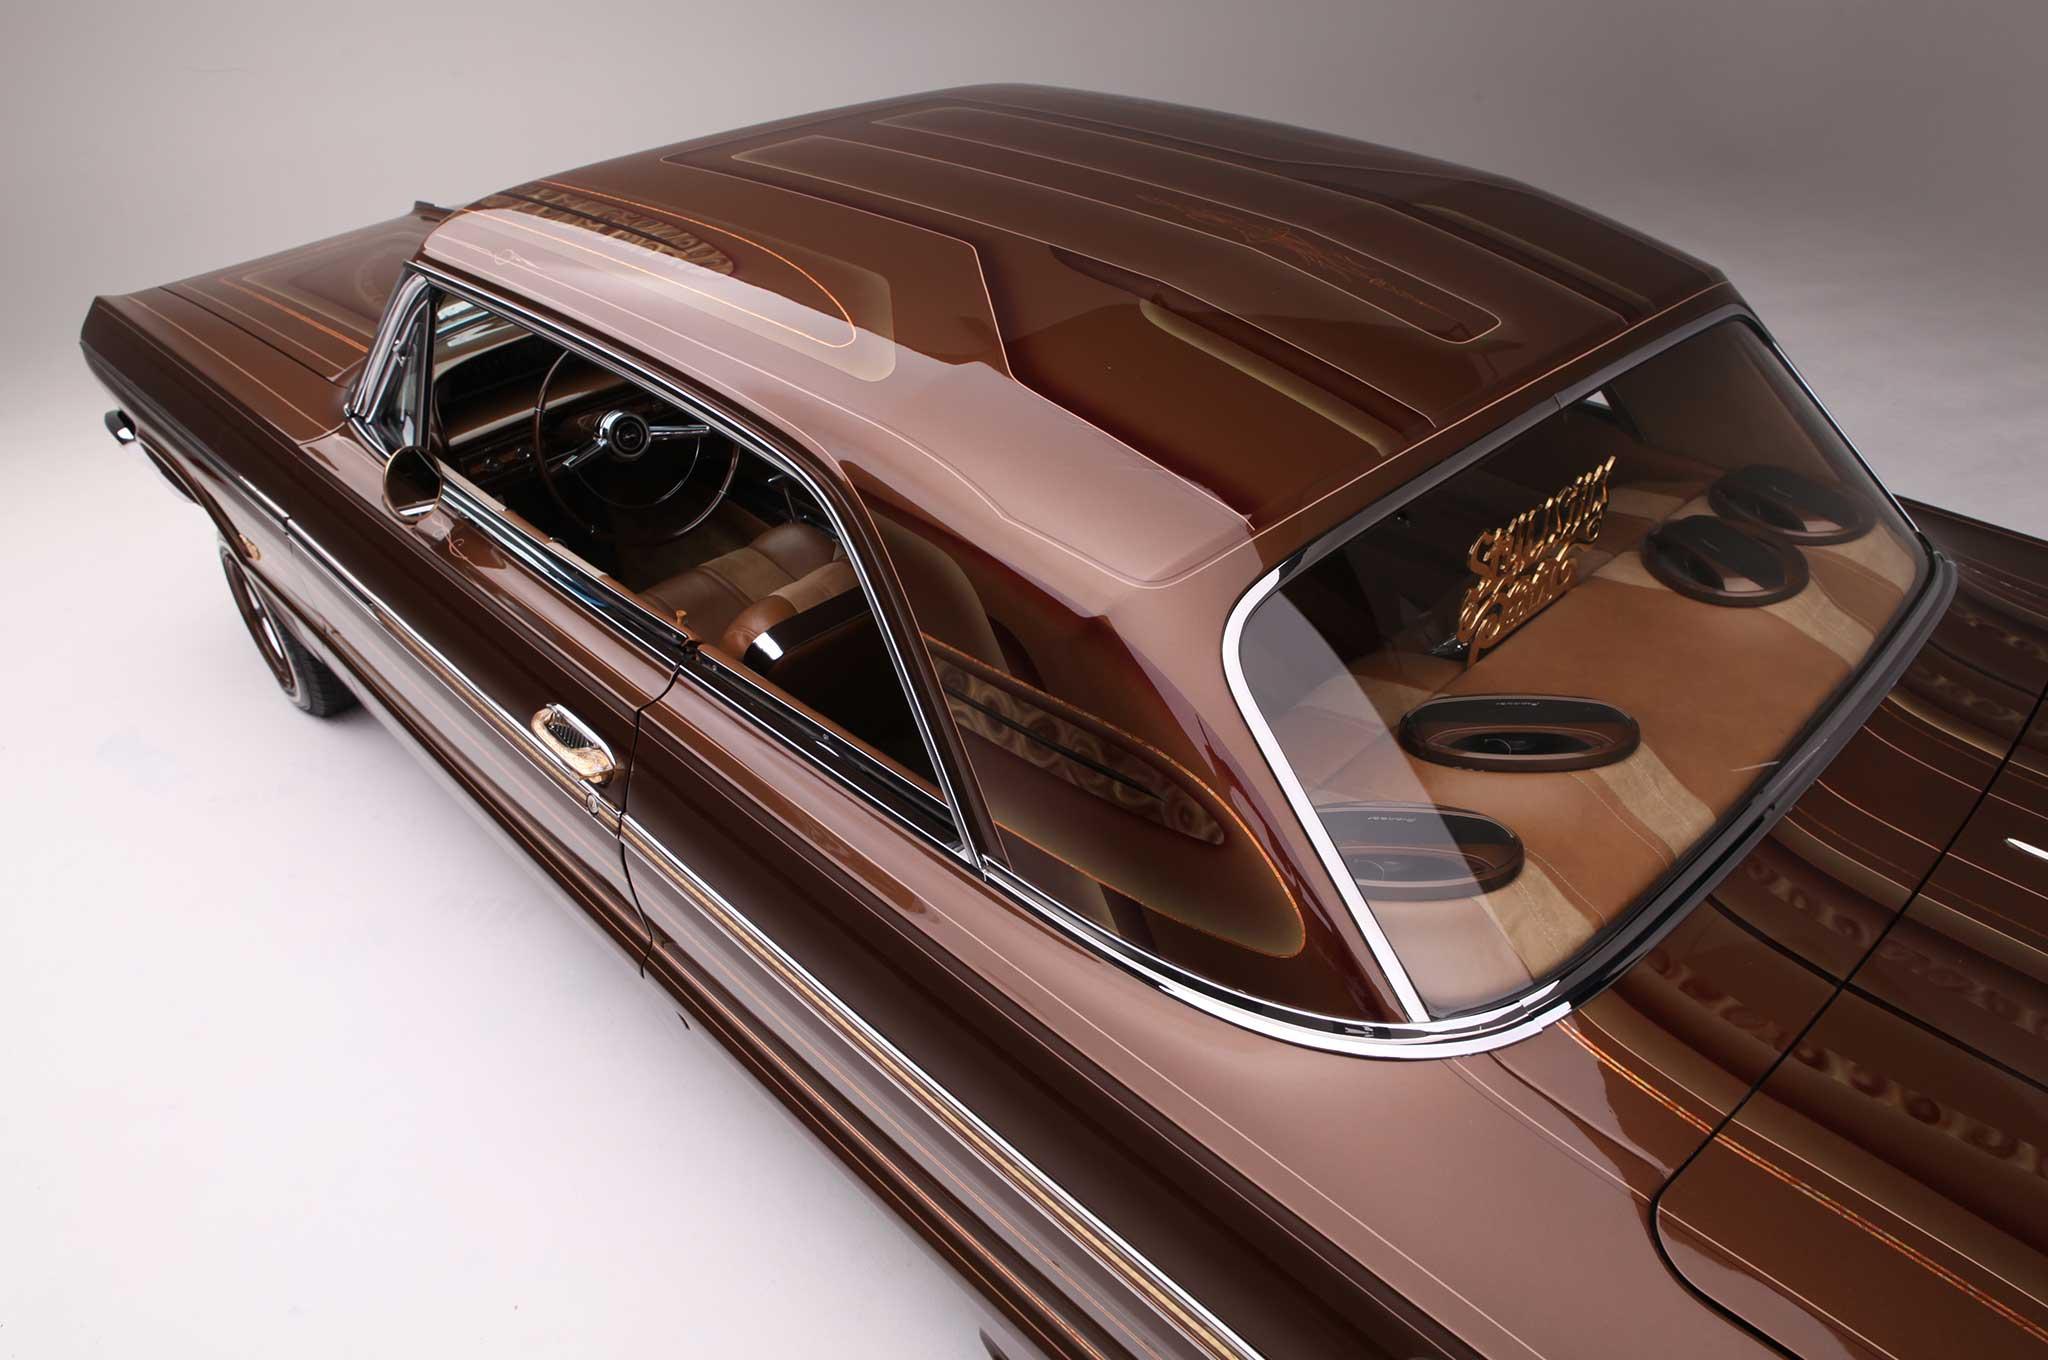 1964 chevrolet impala custom roof